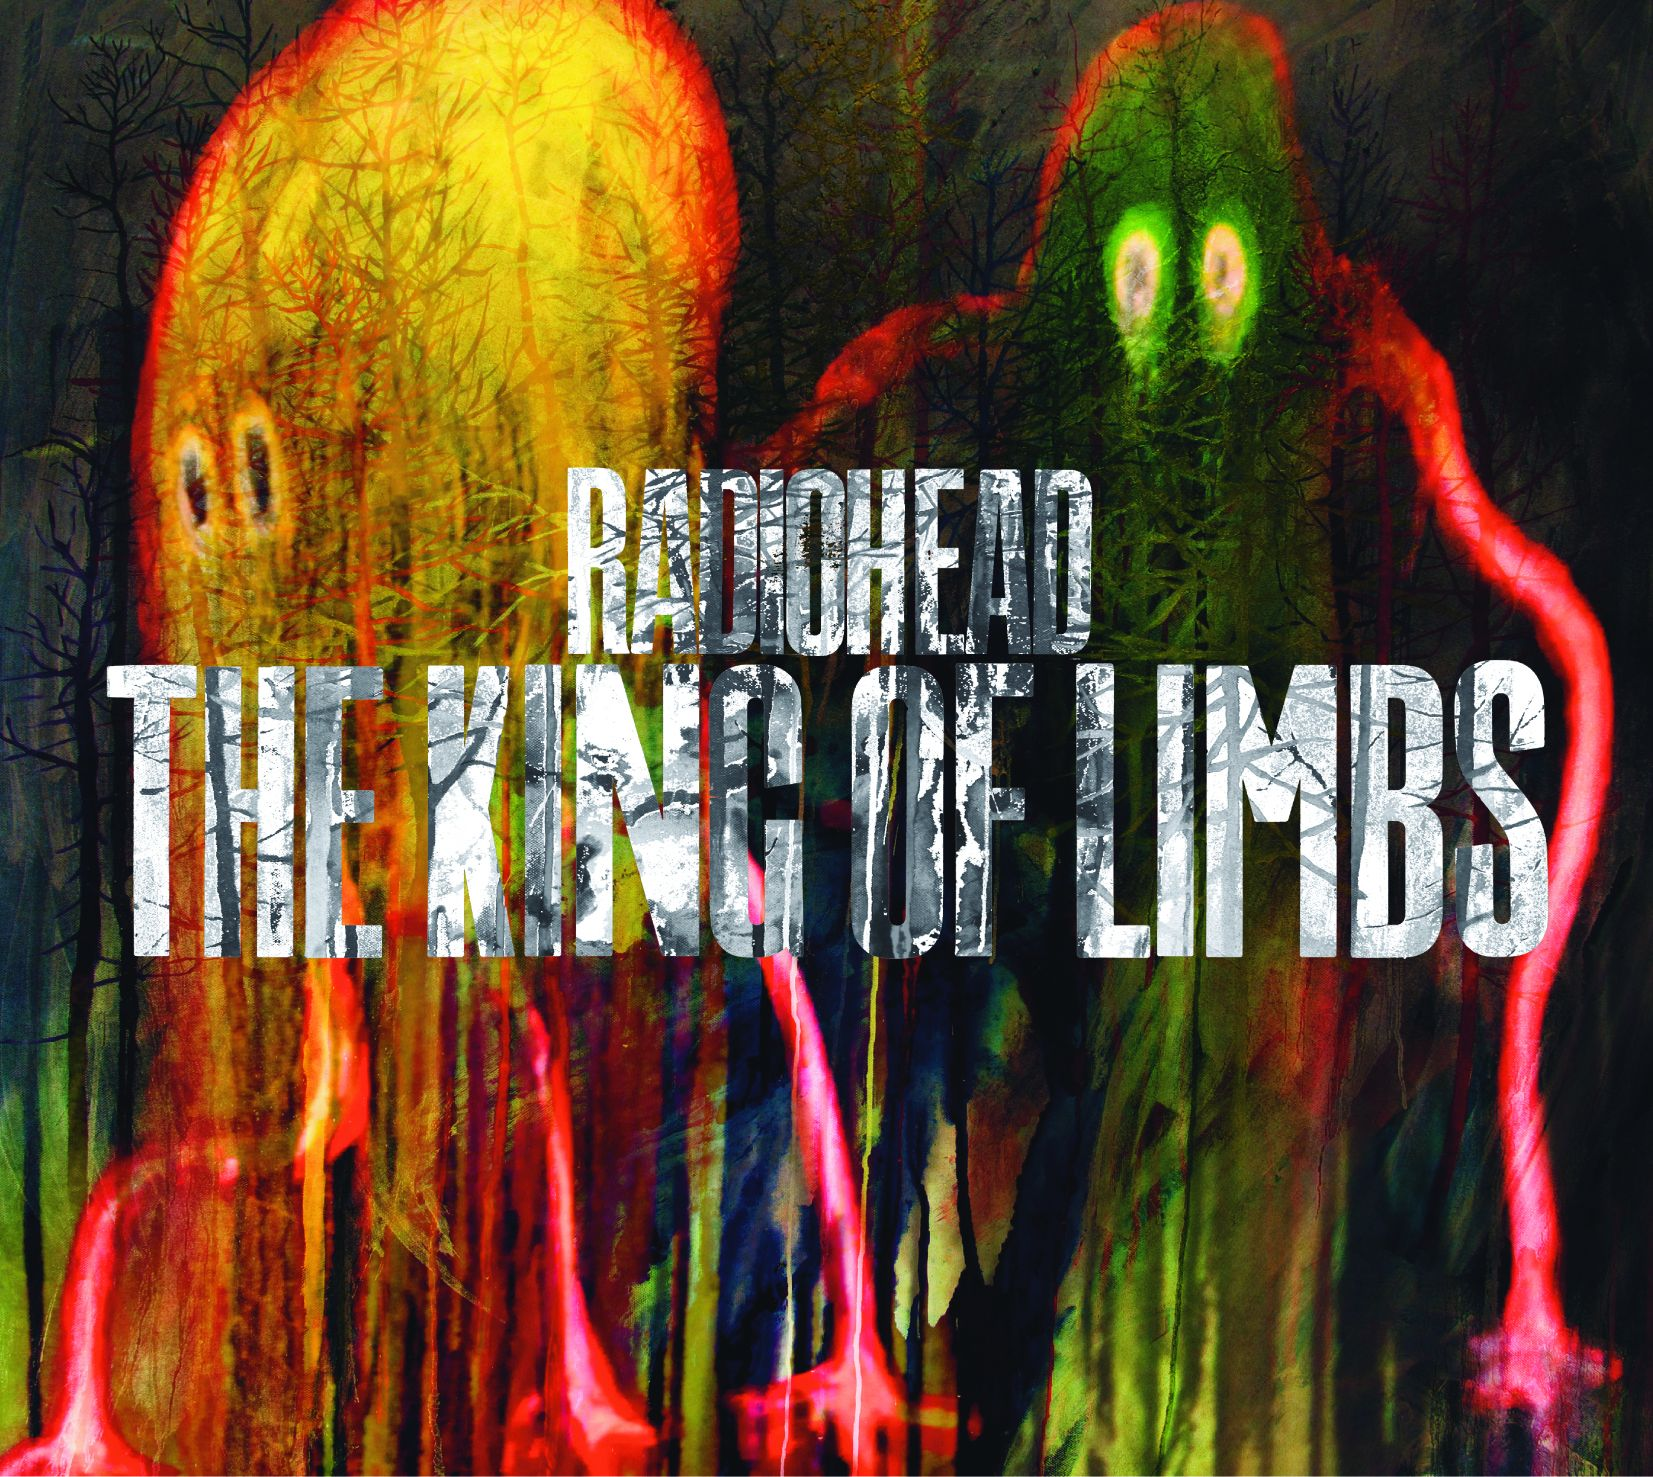 Radiohead - The King Of Limbs album cover